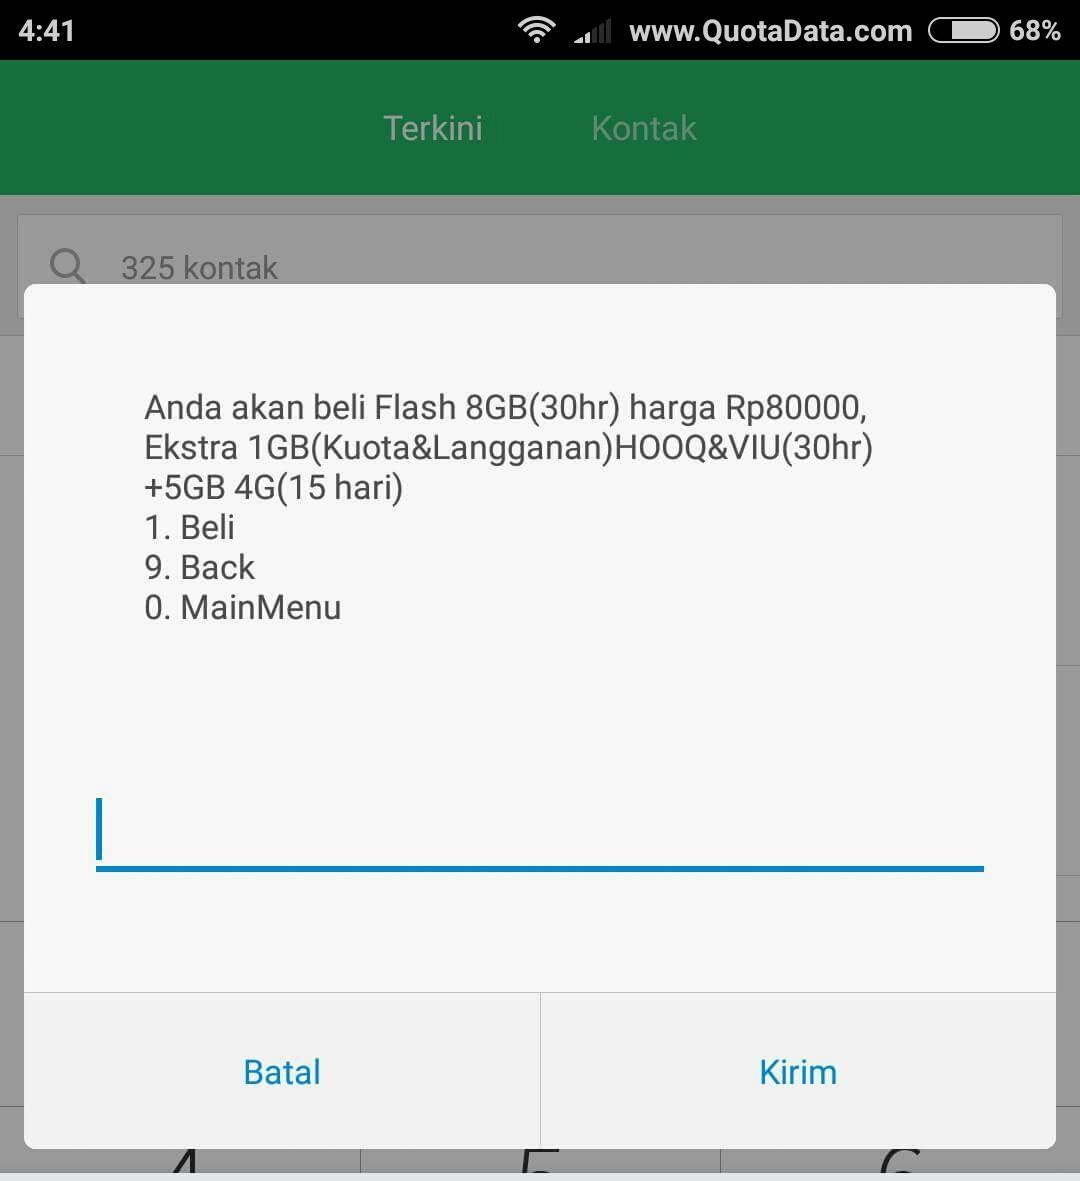 Paket Flash 8gb 80rb Telkomsel 2018 Terbaru Quota Data Internet 12gb 80ribu Kartu As Simpati